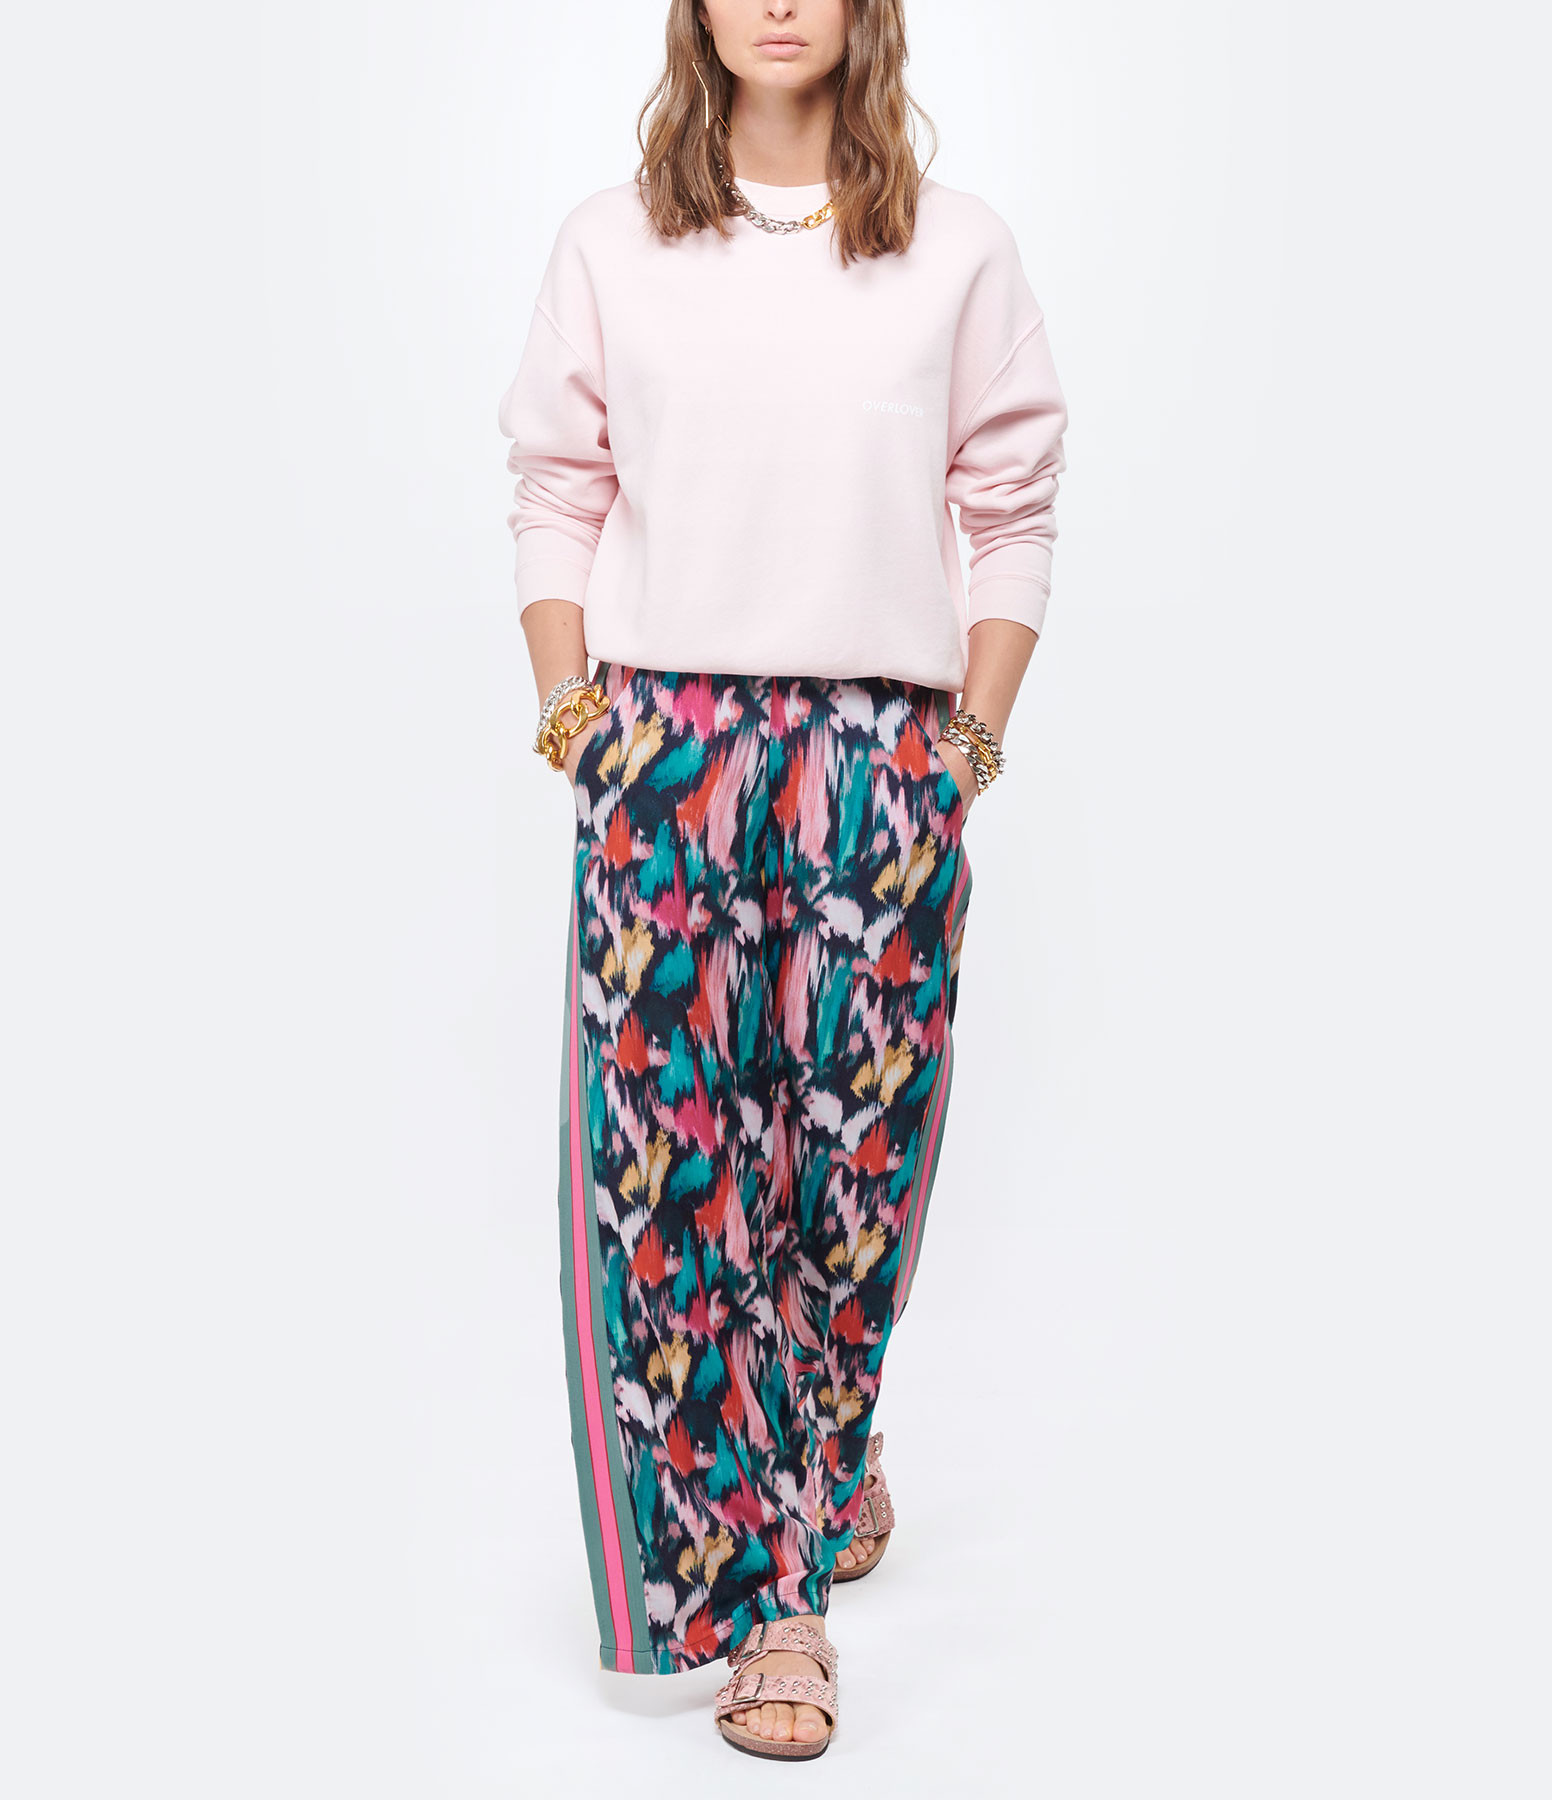 MAISON HAUSSMANN - Pantalon Large Crêpe Bohol Imprimé